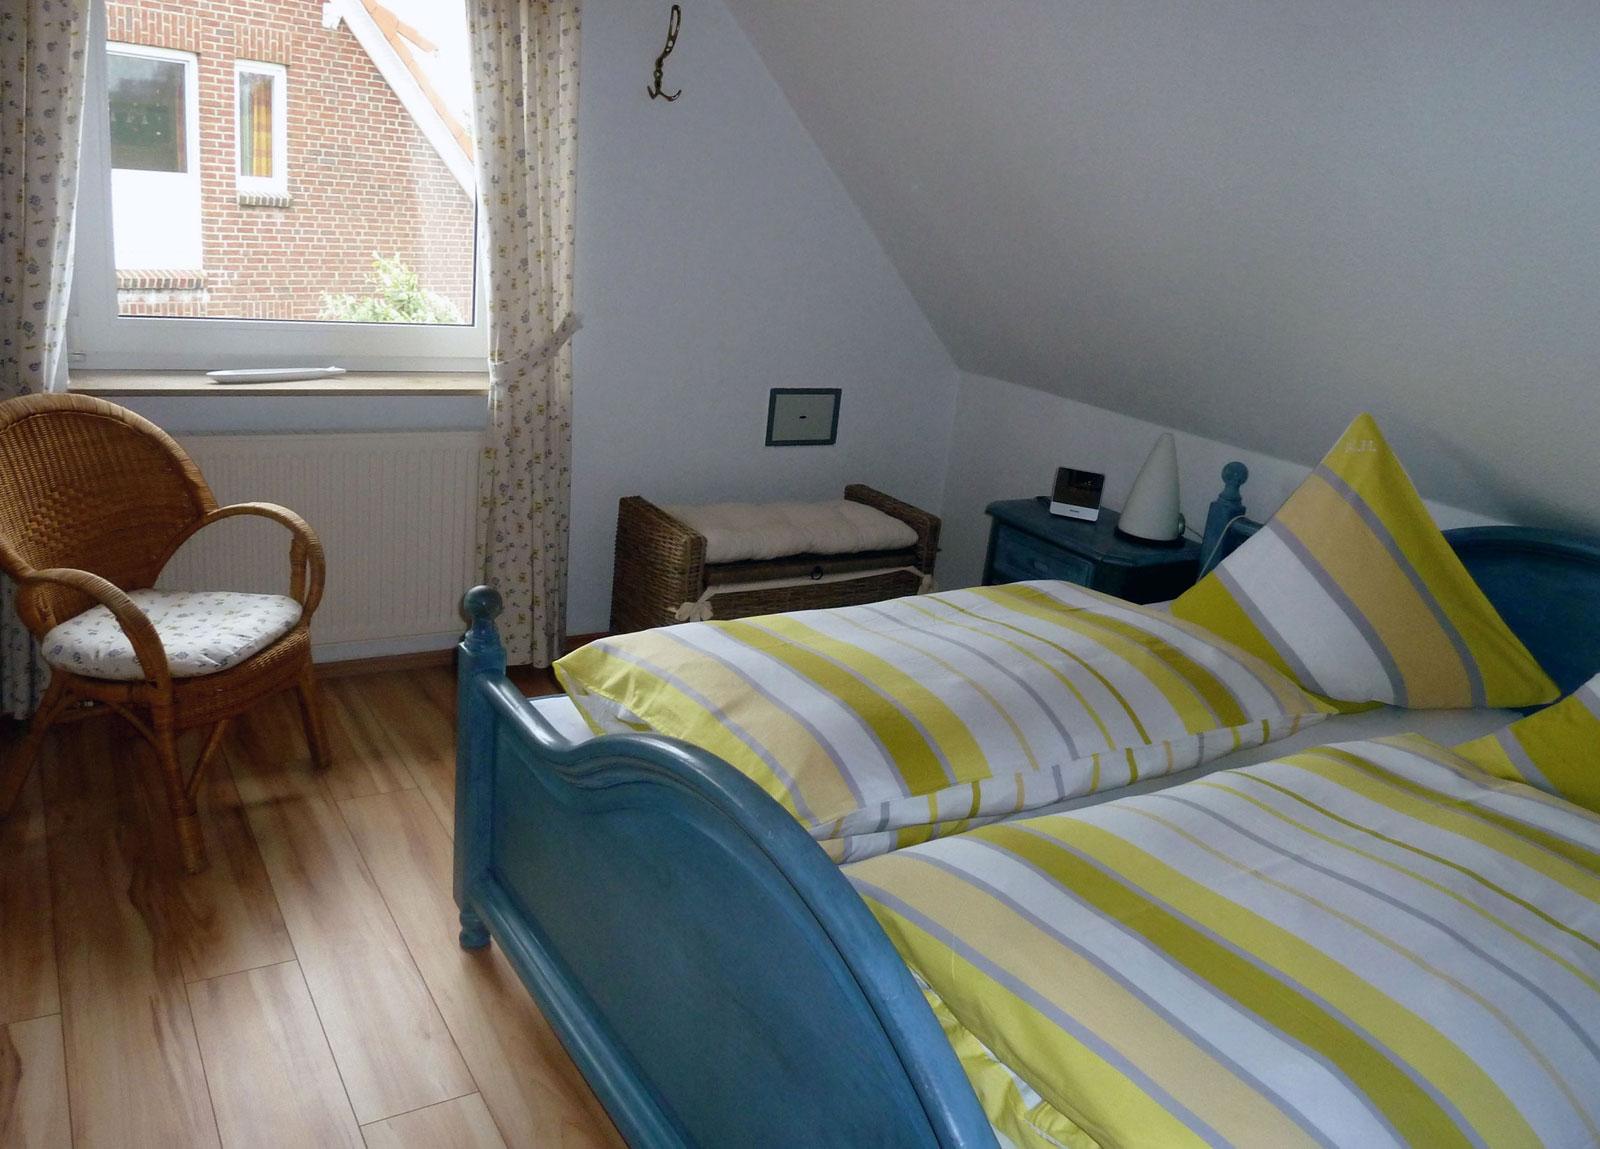 Helles grosses Schlafzimmer